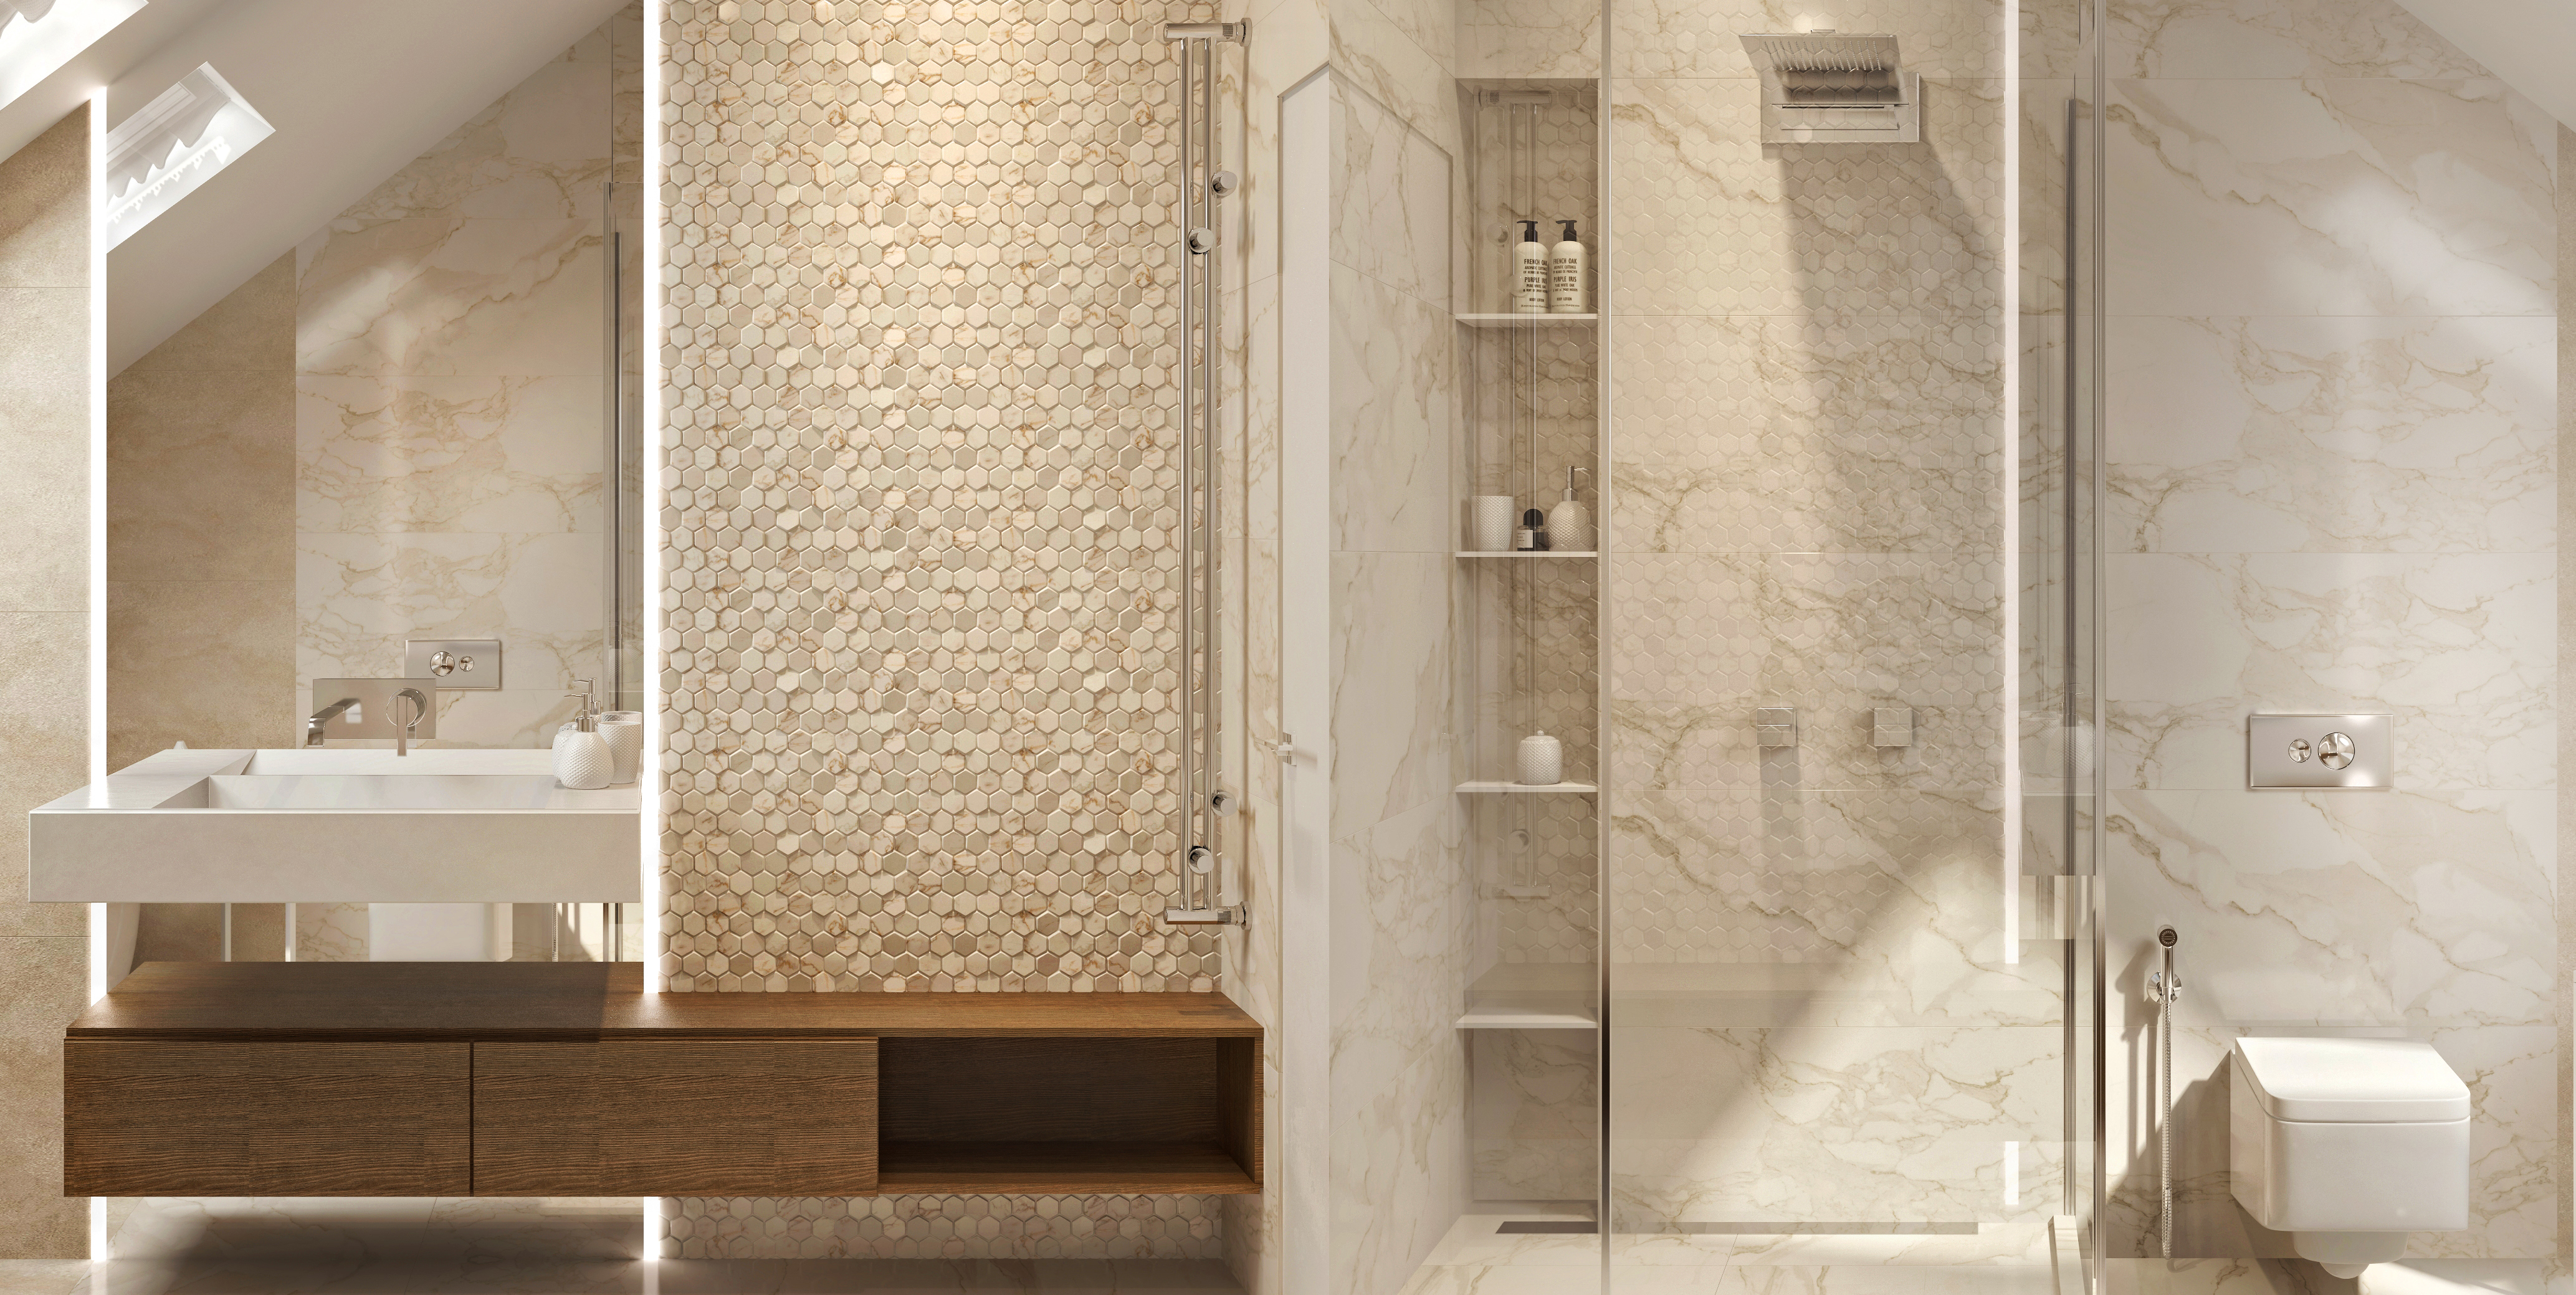 Дизайн ванной комнаты в таунхаусе. Заповедный парк.